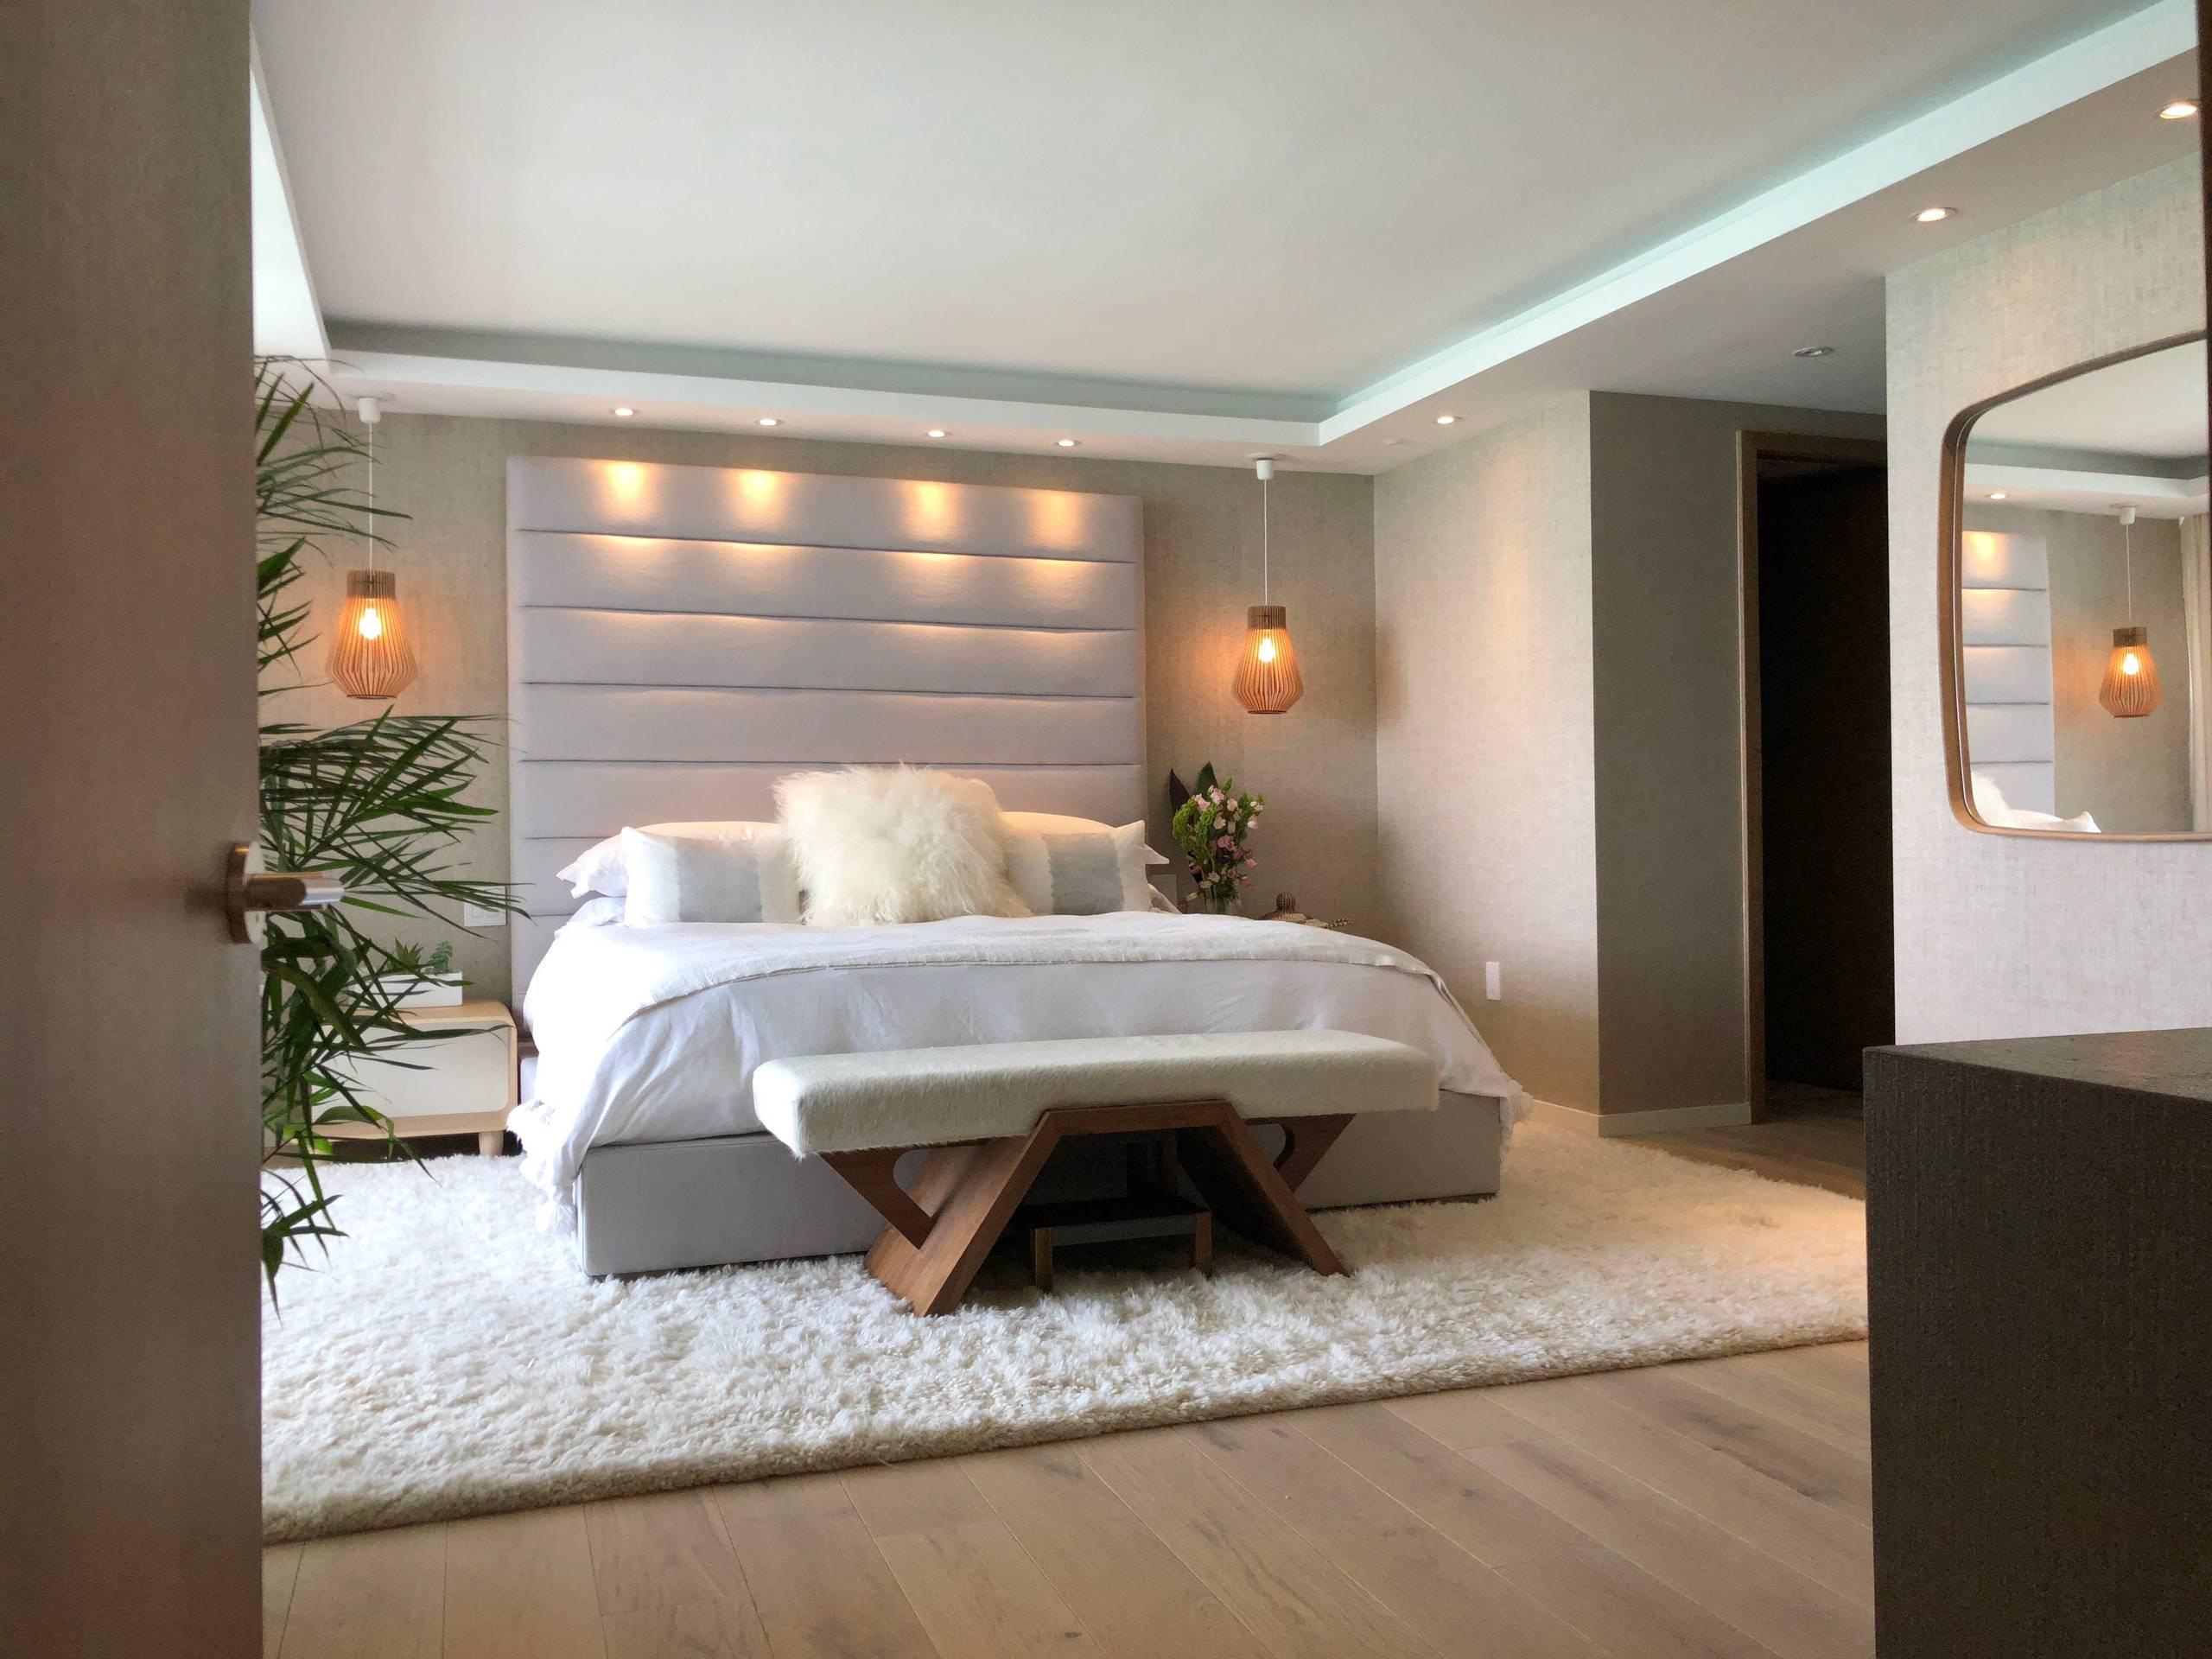 75 beautiful modern bedroom pictures